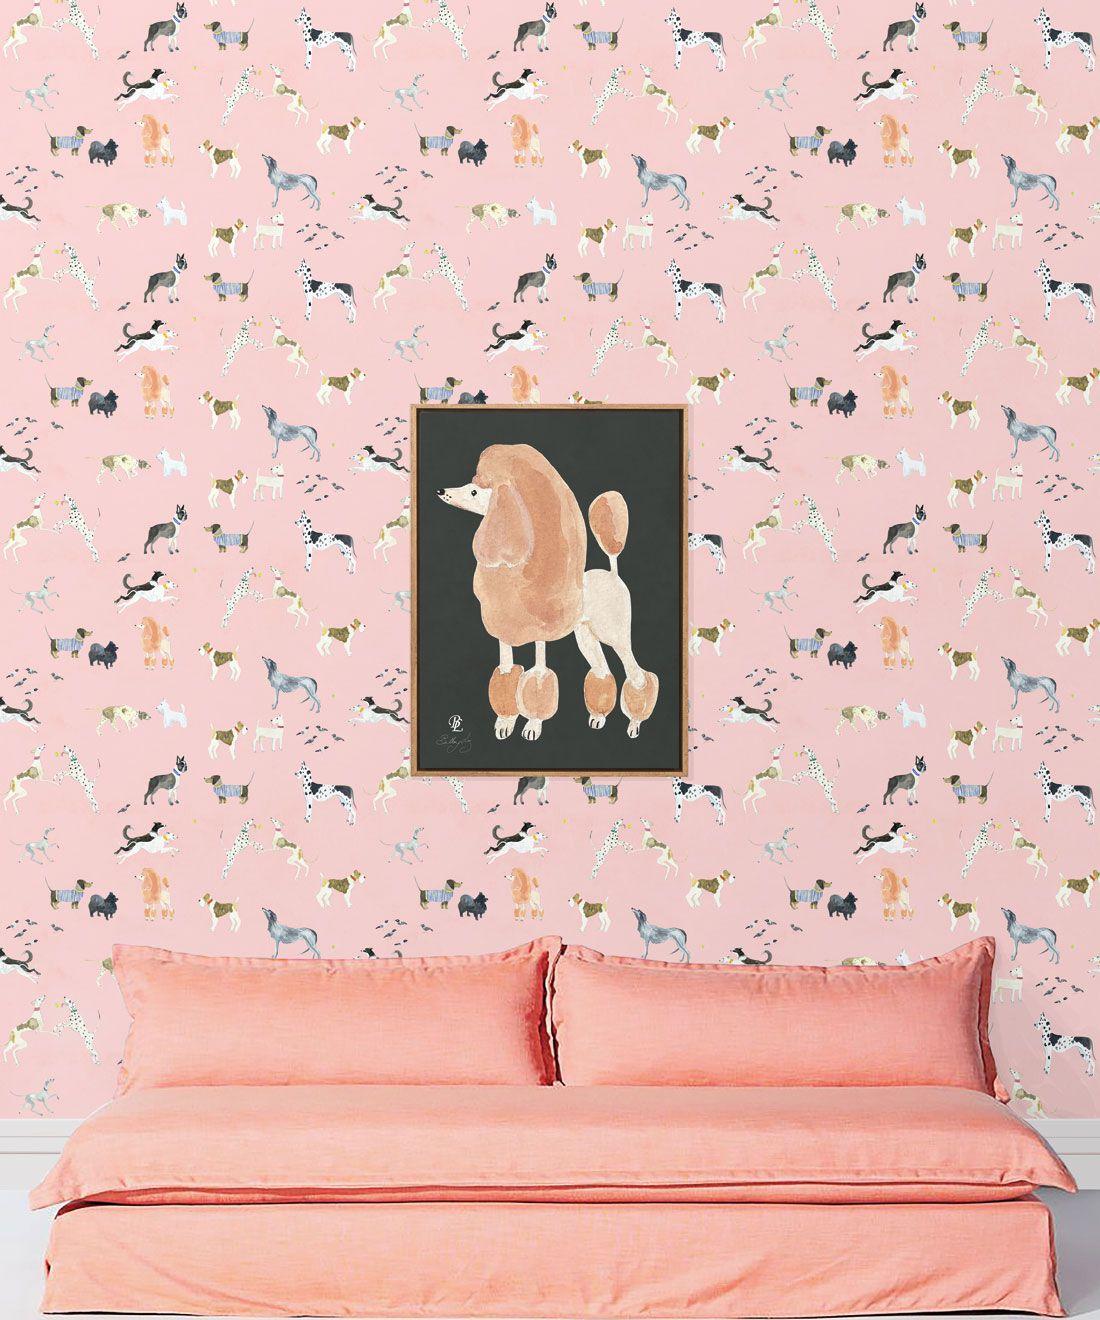 Doggies Wallpaper •Dog Wallpaper •Pink • insitu with salmon colored sofa